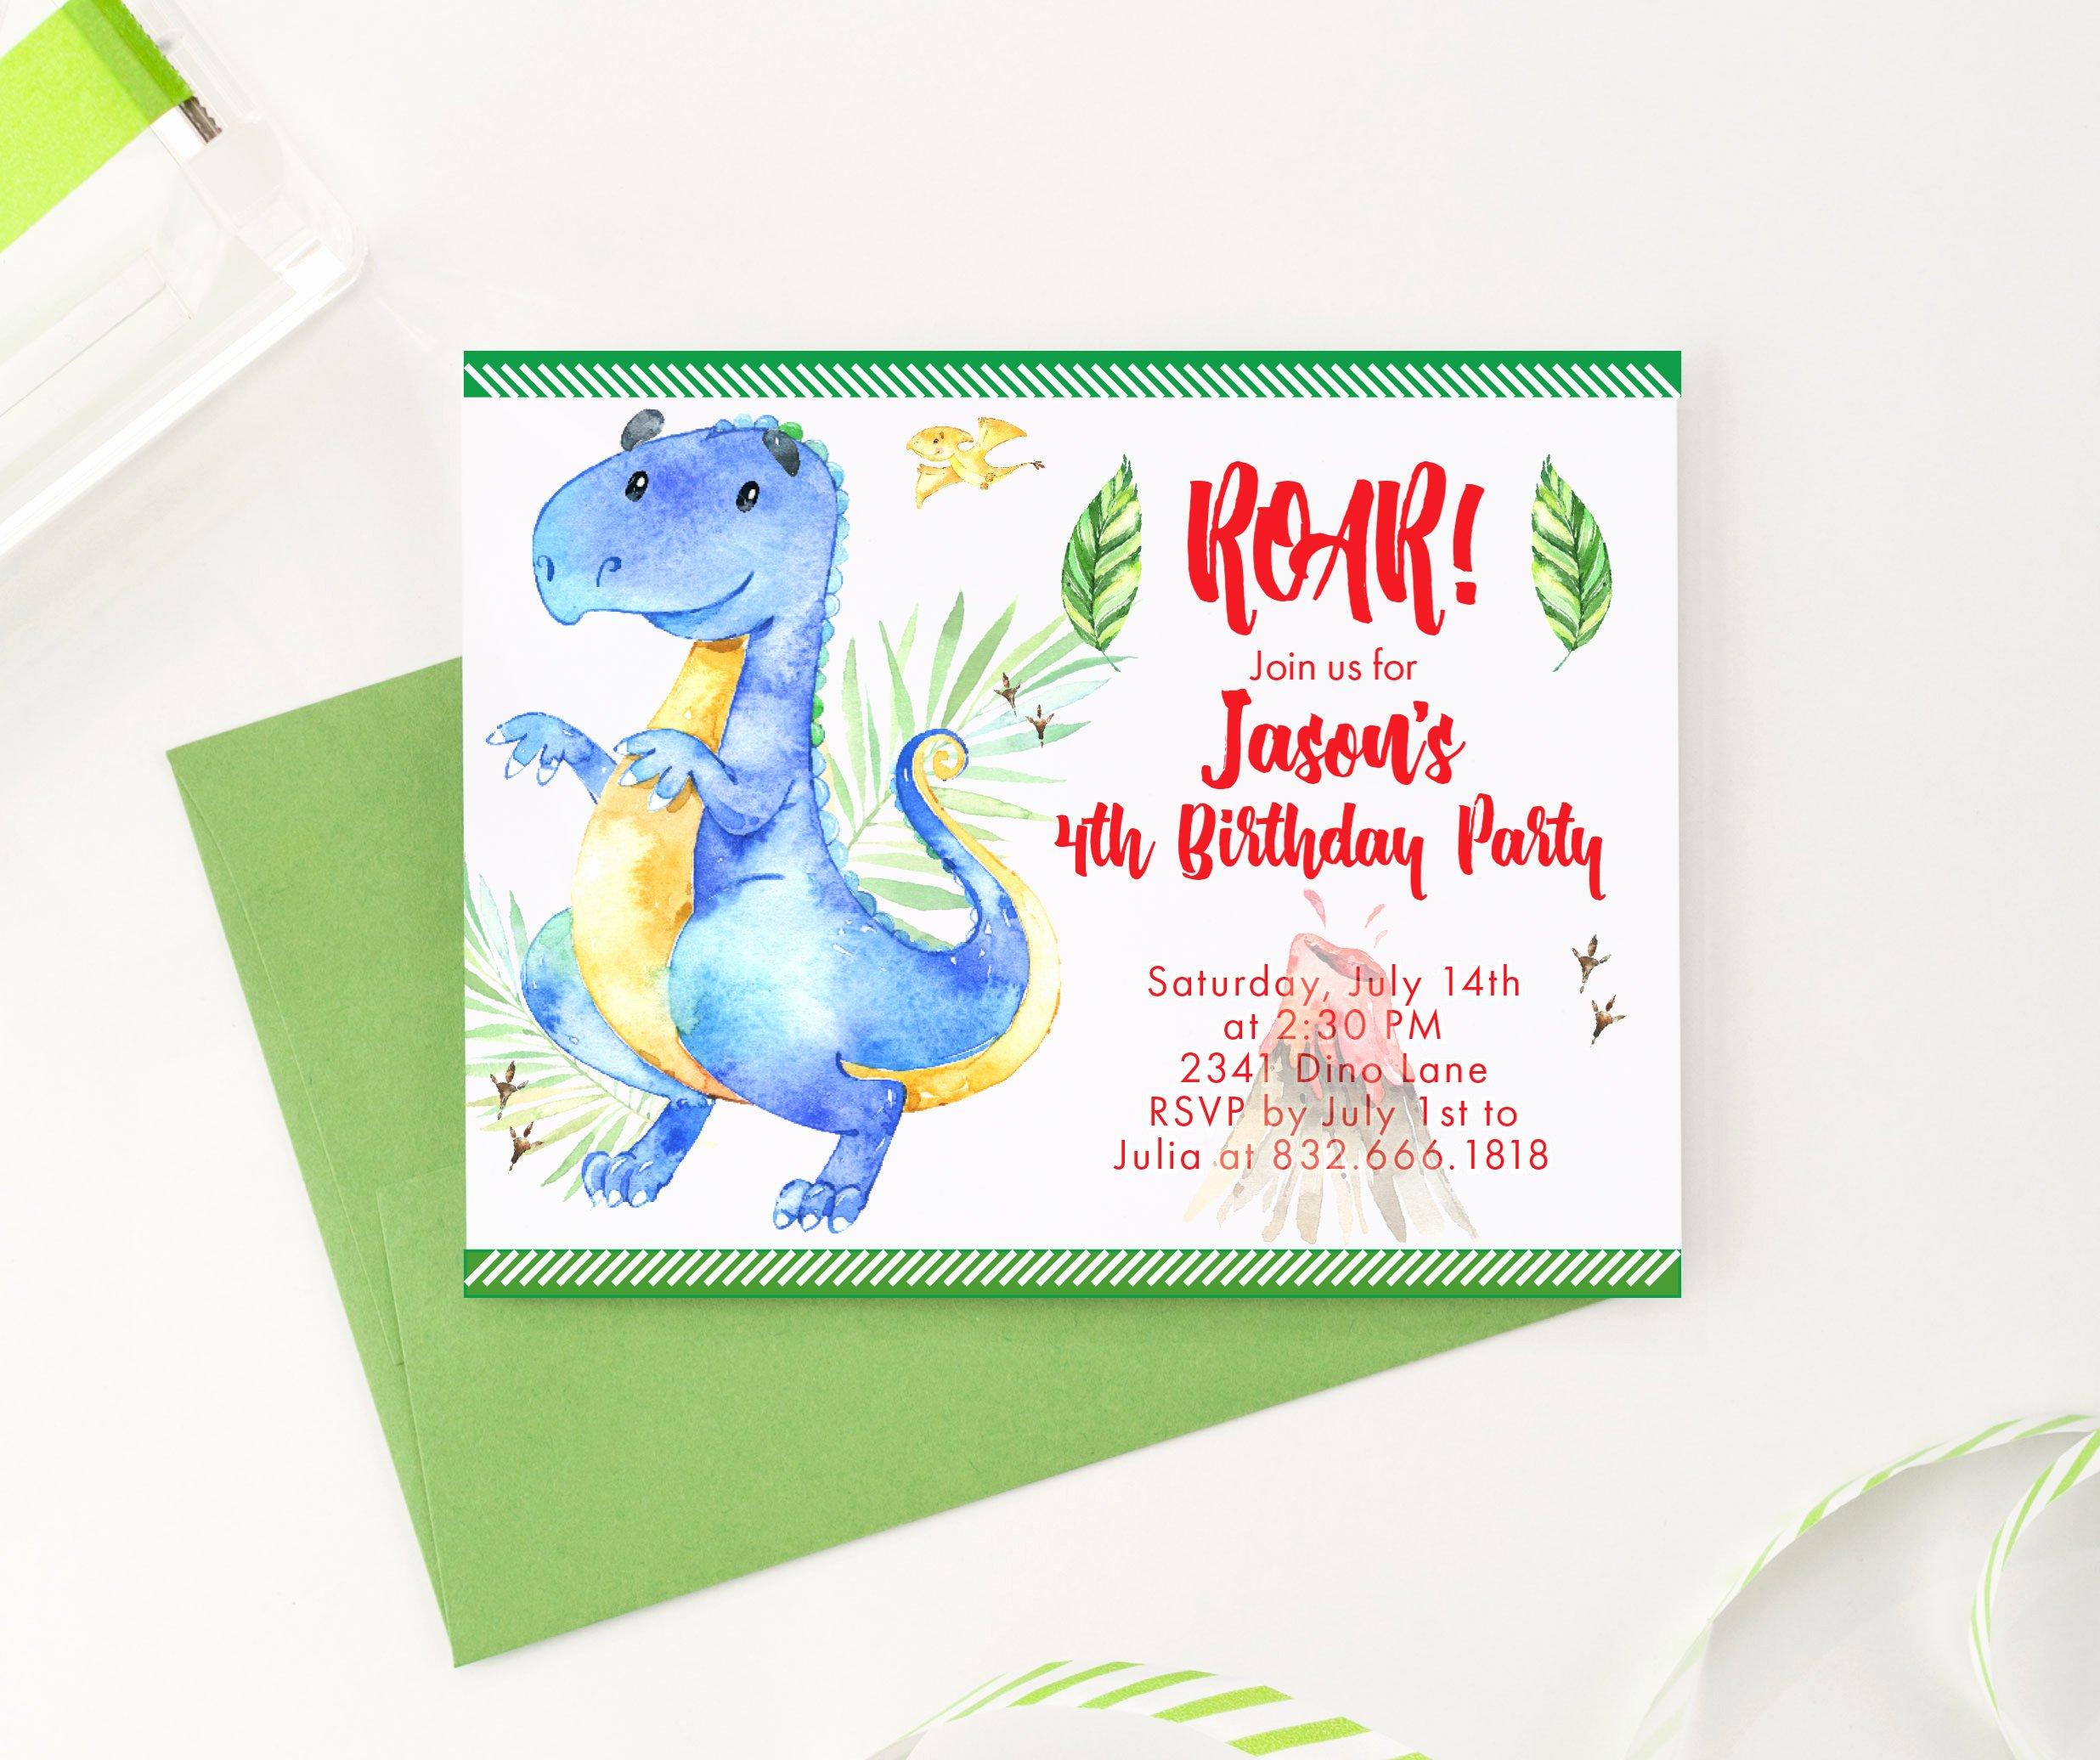 Dinosaur Birthday Party Invitations Beautiful Dinosaur Birthday Invitation Dinosaurs Dino Birthday